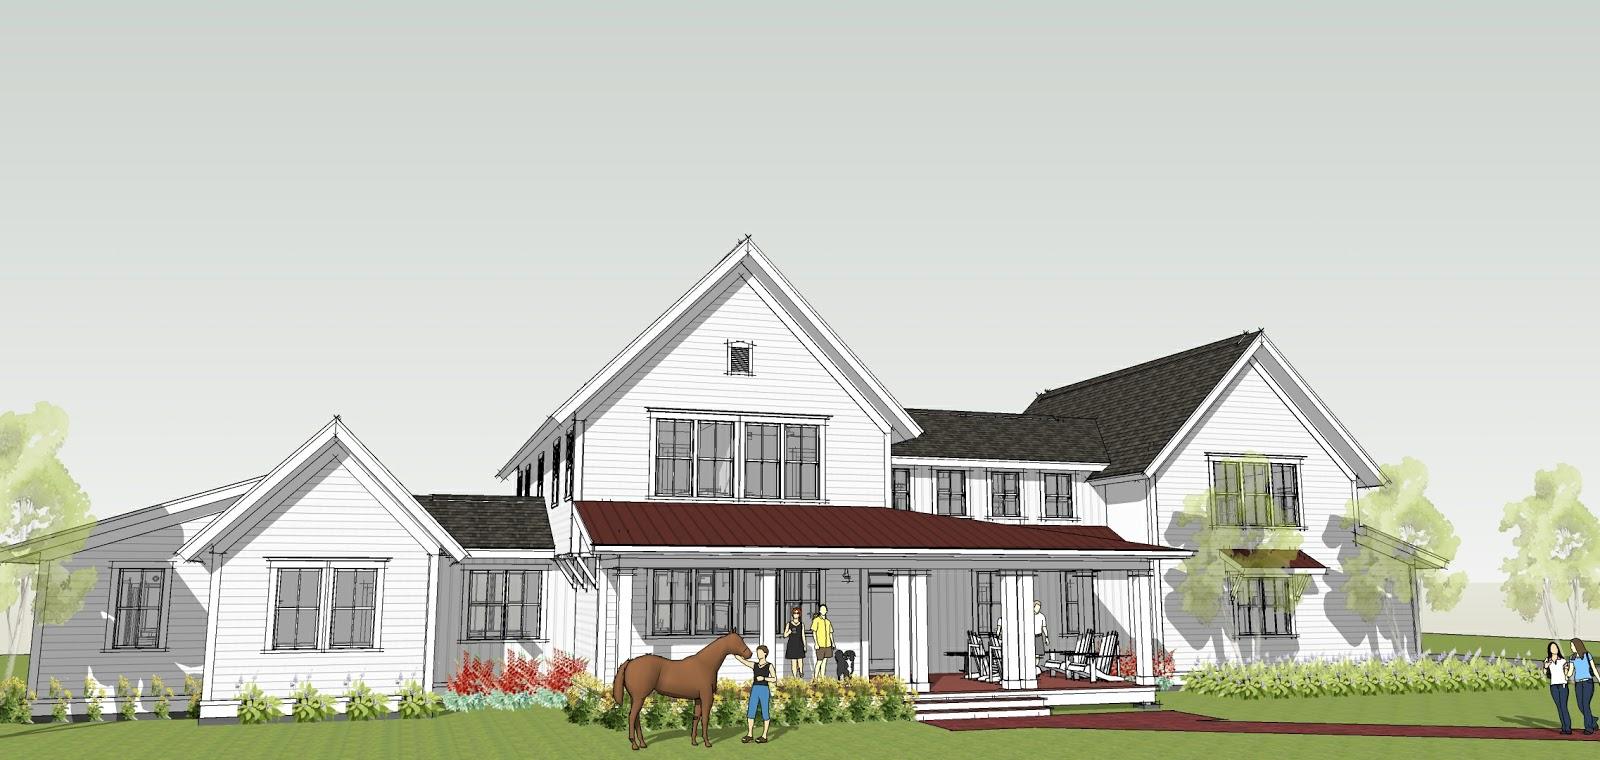 Simply Elegant Home Designs Blog: Modern Farmhouse by Ron ...